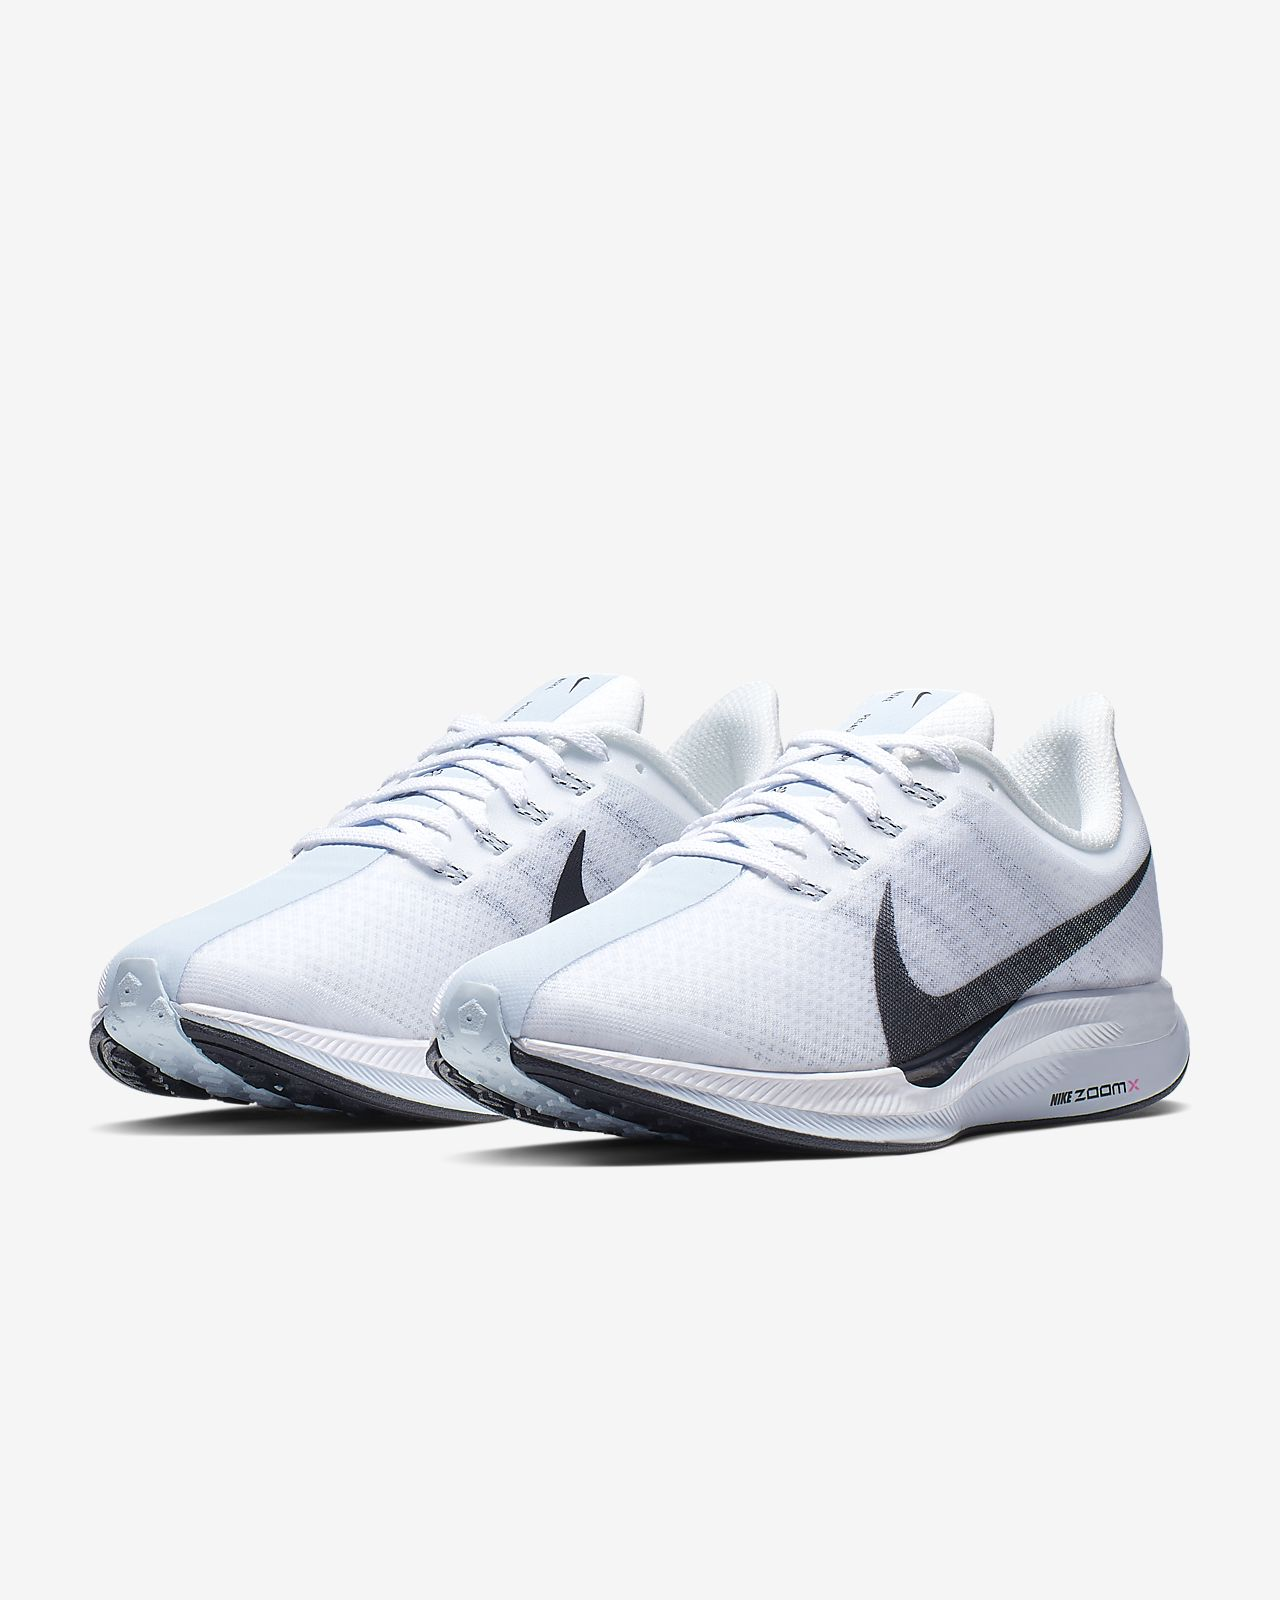 best wholesaler b9682 317a0 ... Nike Zoom Pegasus Turbo Women s Running Shoe